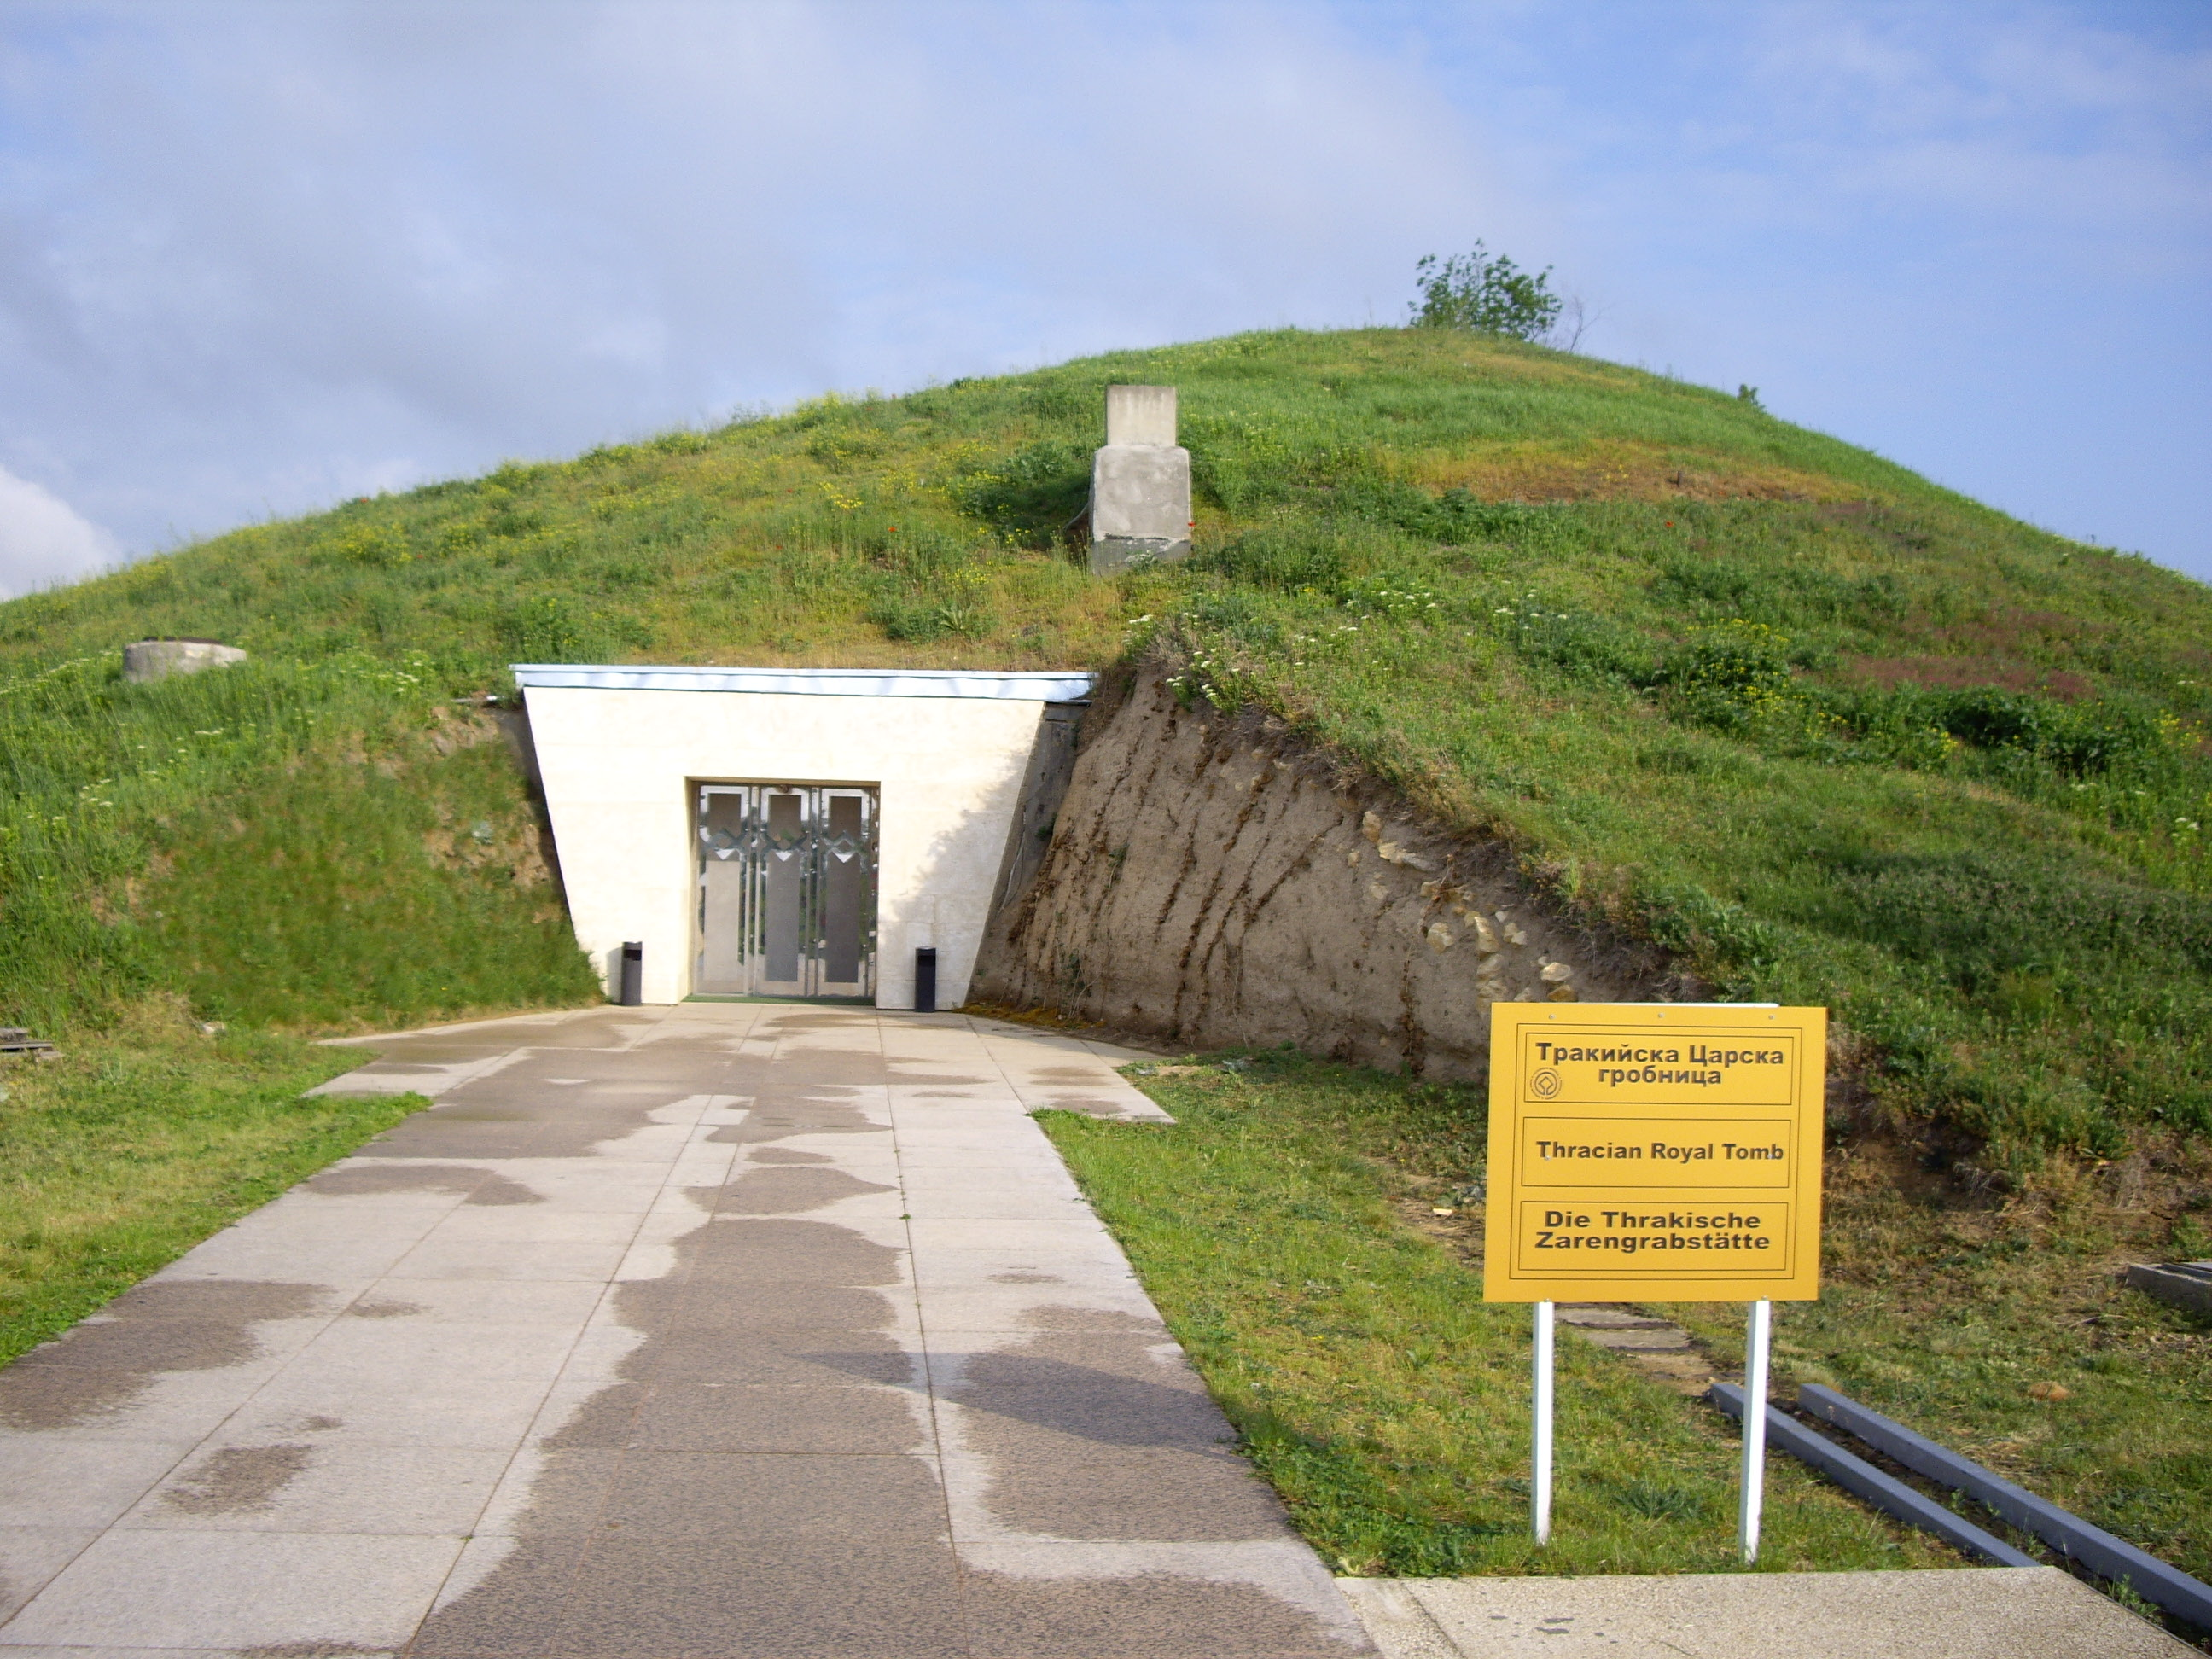 4.3.3.4. Sveshtarska Thracian Royal Tomb 1